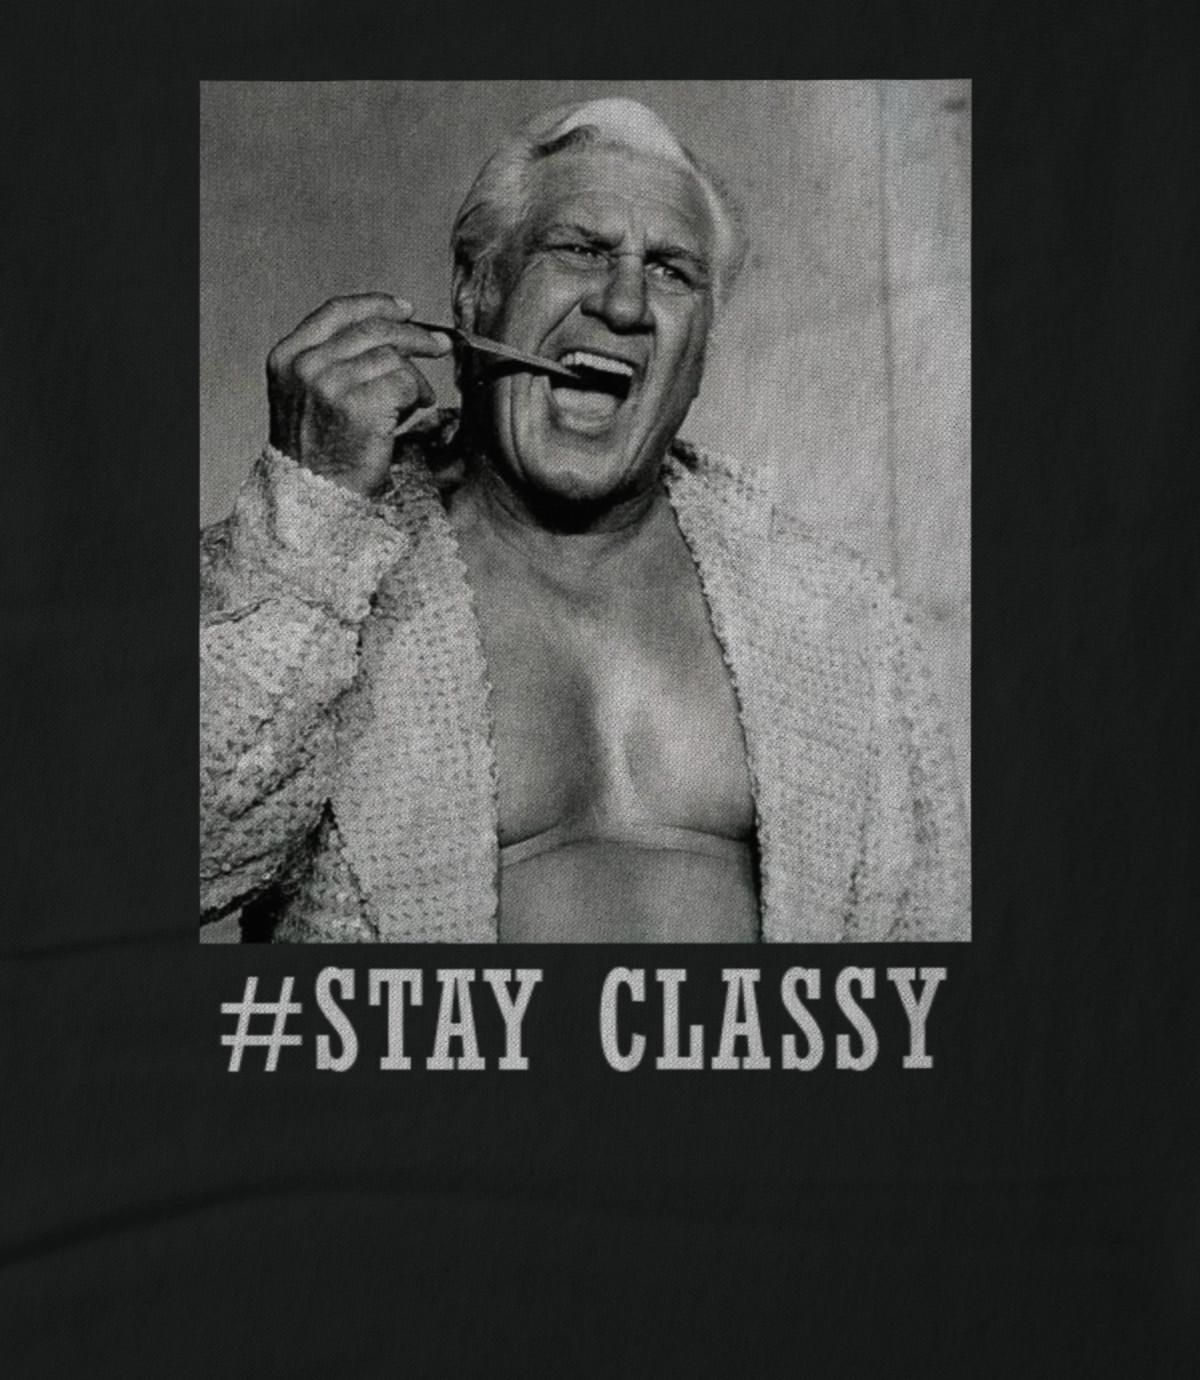 Hogtown pro wrestling stay classy 1478543275